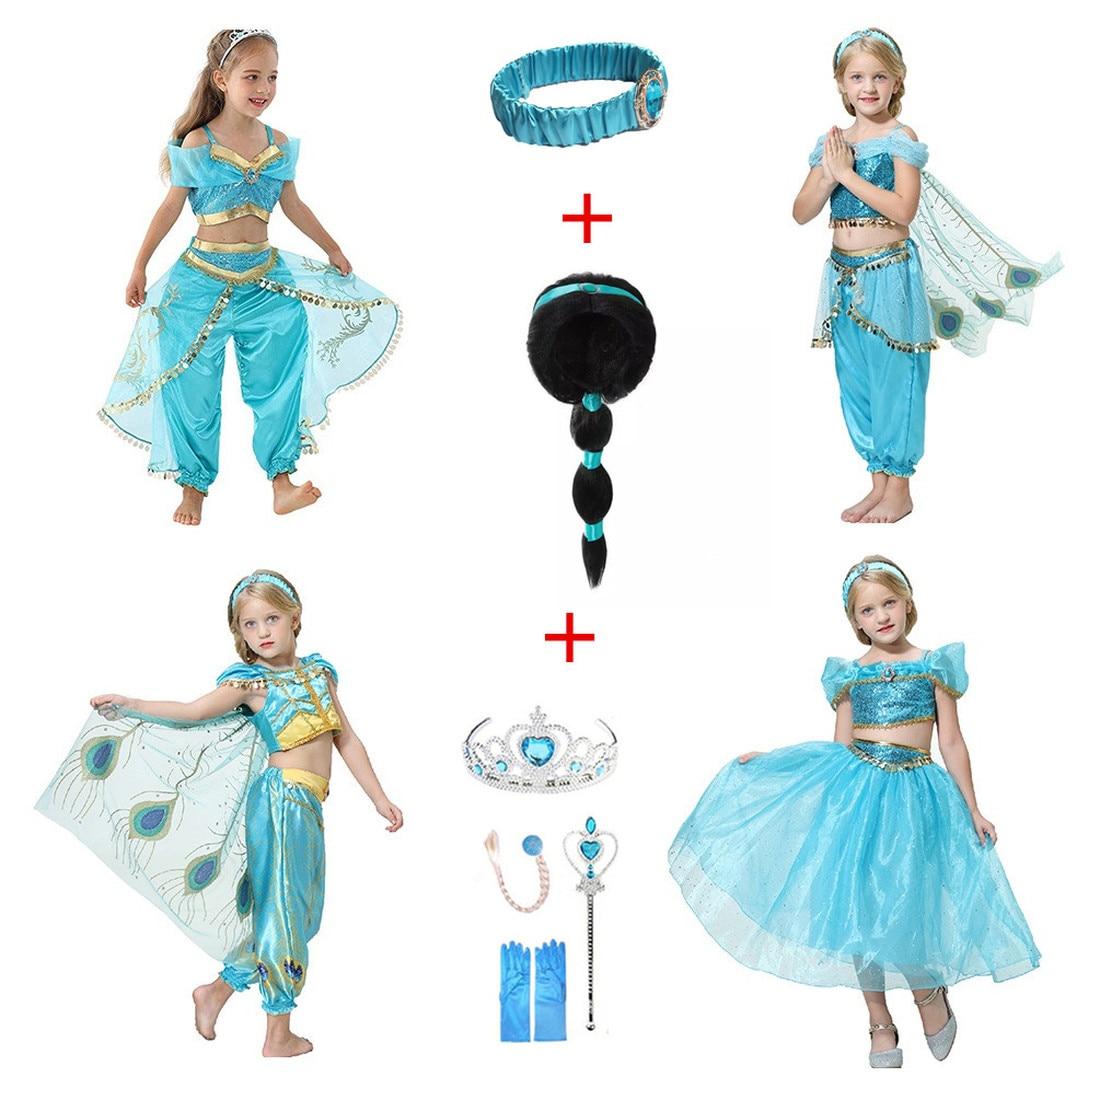 2019 Carnival Children's Dress Aladdin's Lamp Cosplay Halloween Costume+wig Jasmine Princess Girl Dress Role Clothes Sets+gift